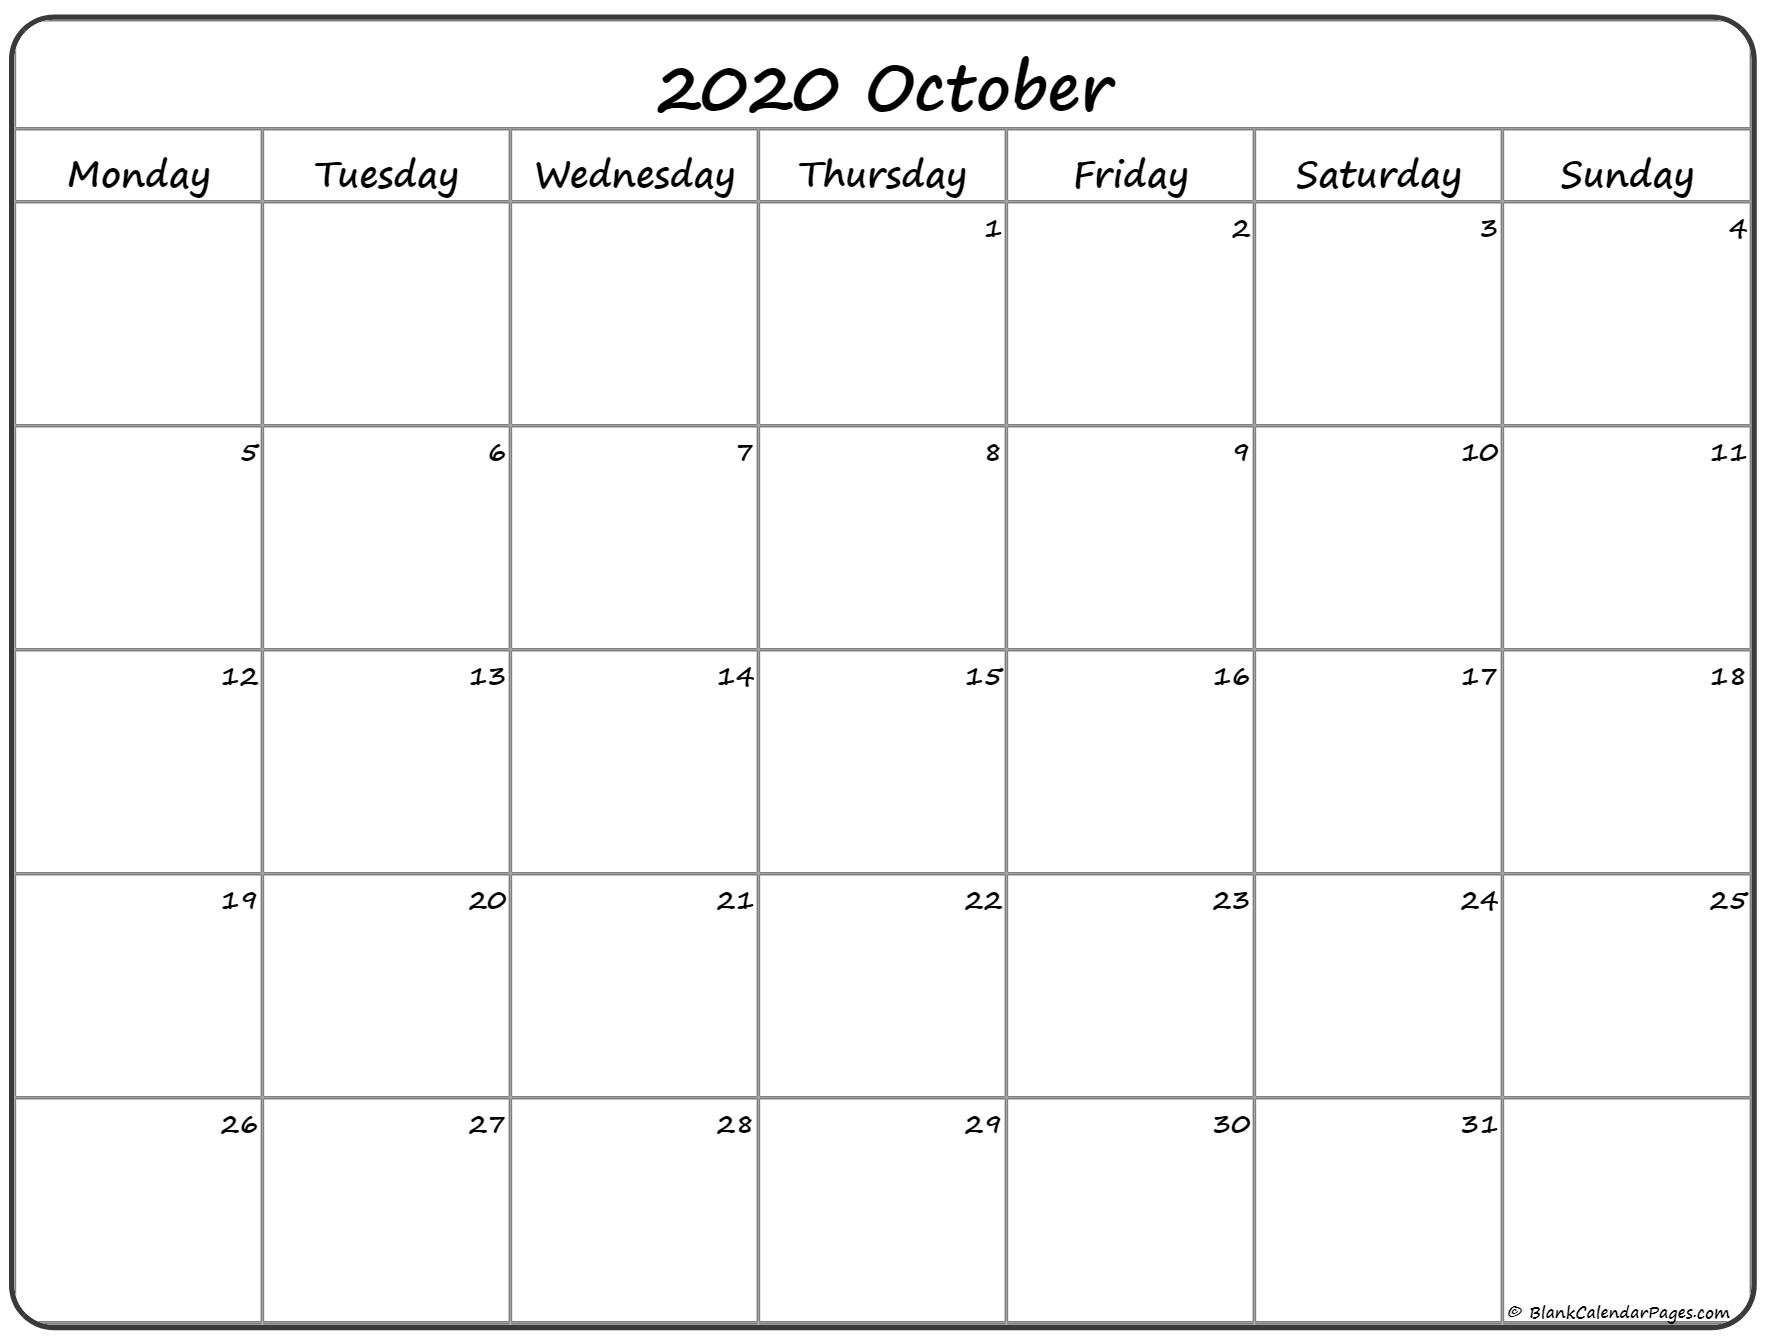 October 2020 Monday Calendar   Monday To Sunday Monday Through Sunday Planner